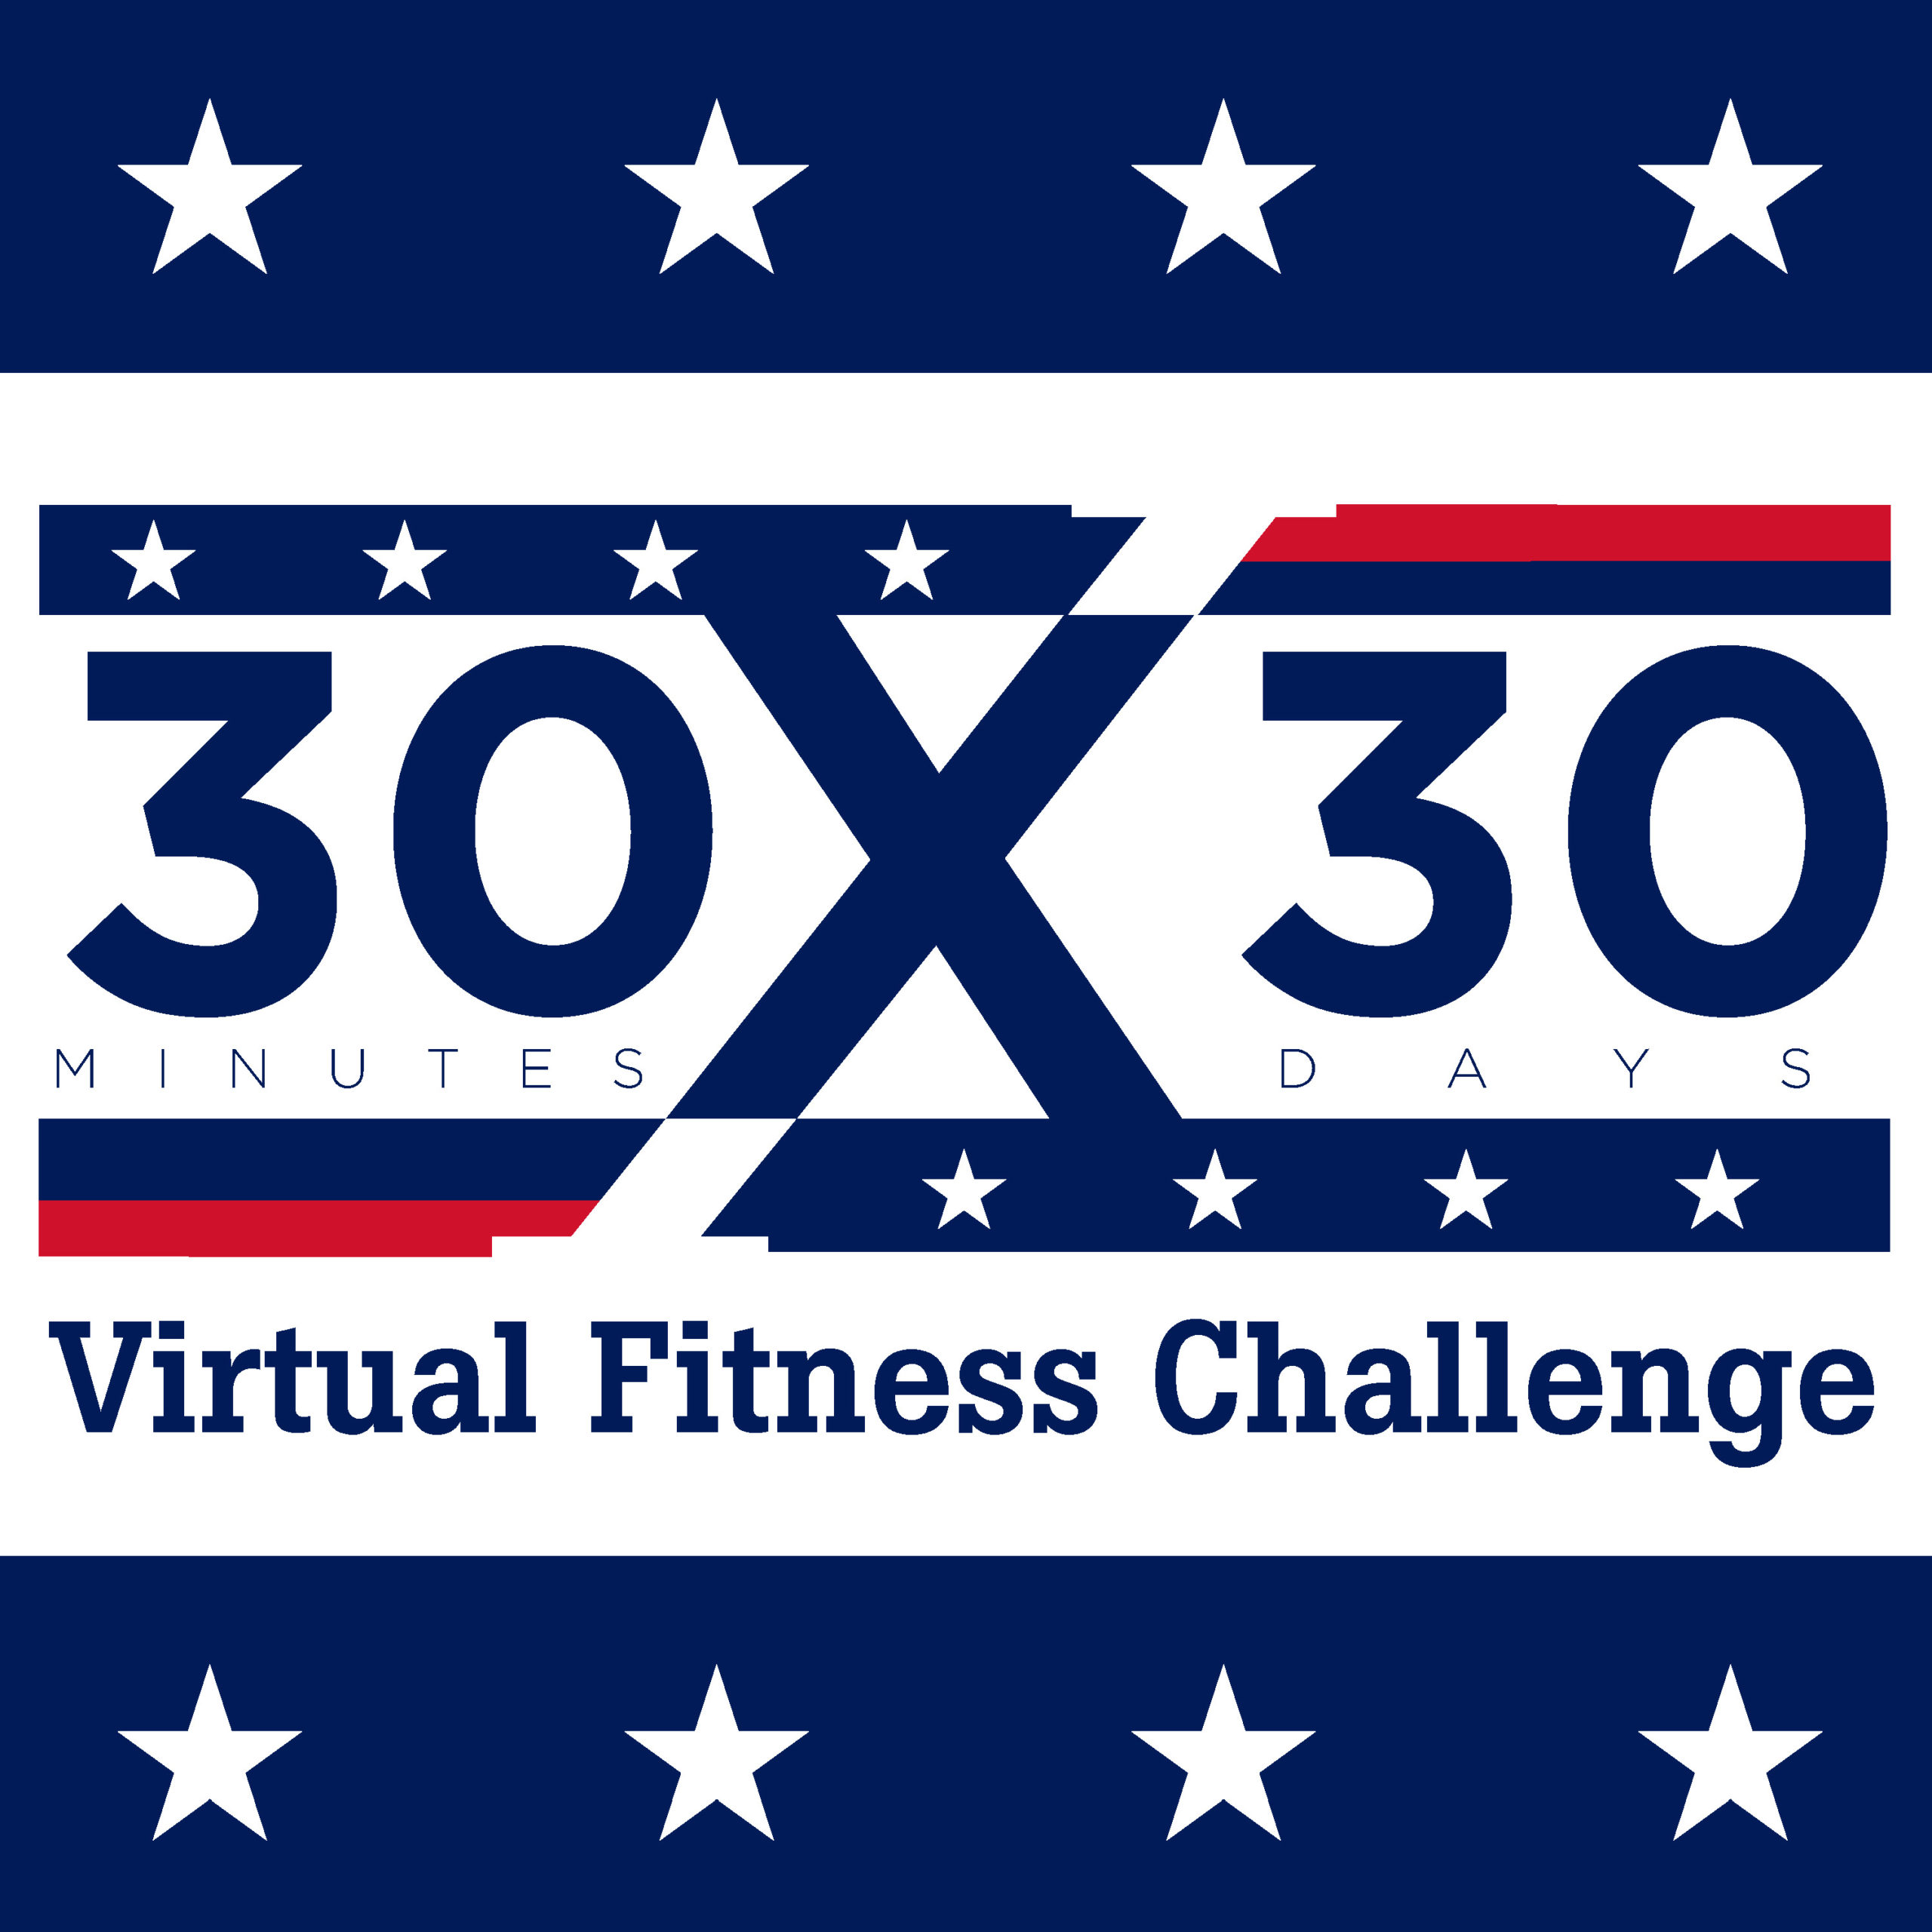 30x30 Fitness Challenge